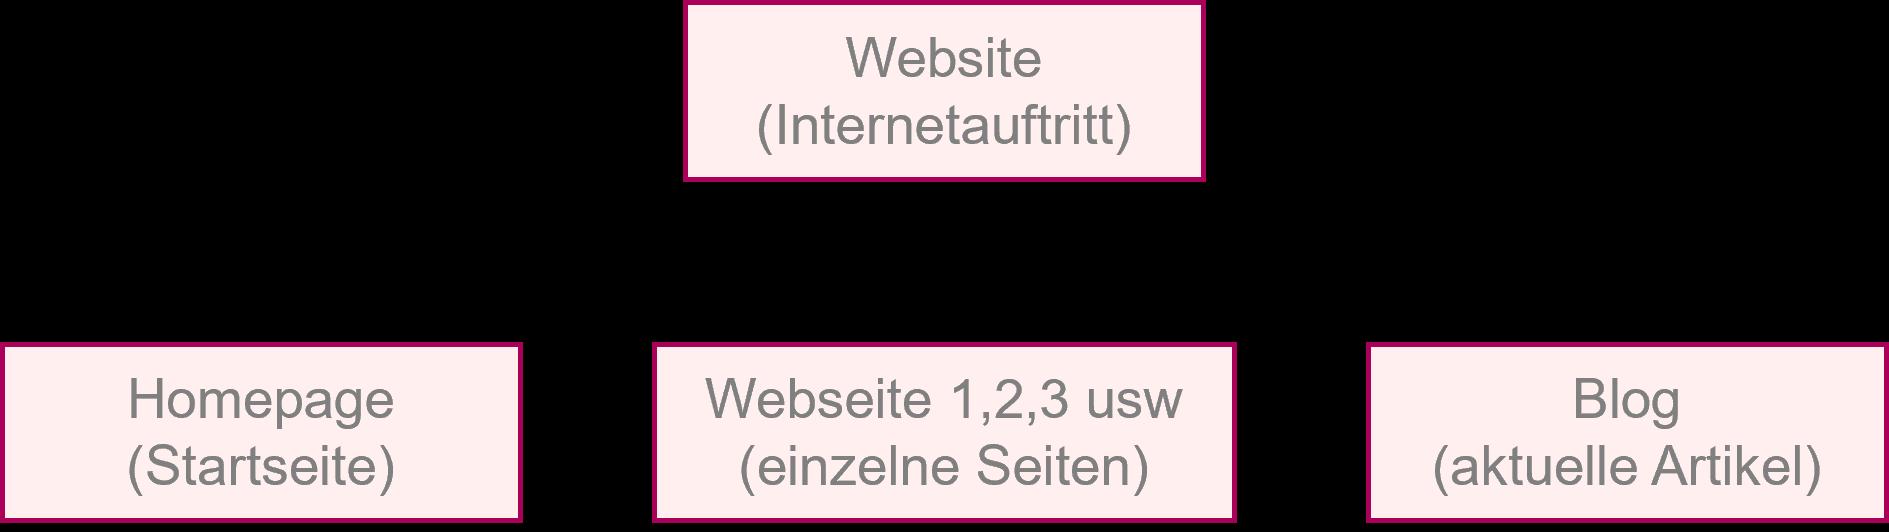 Website-Struktur